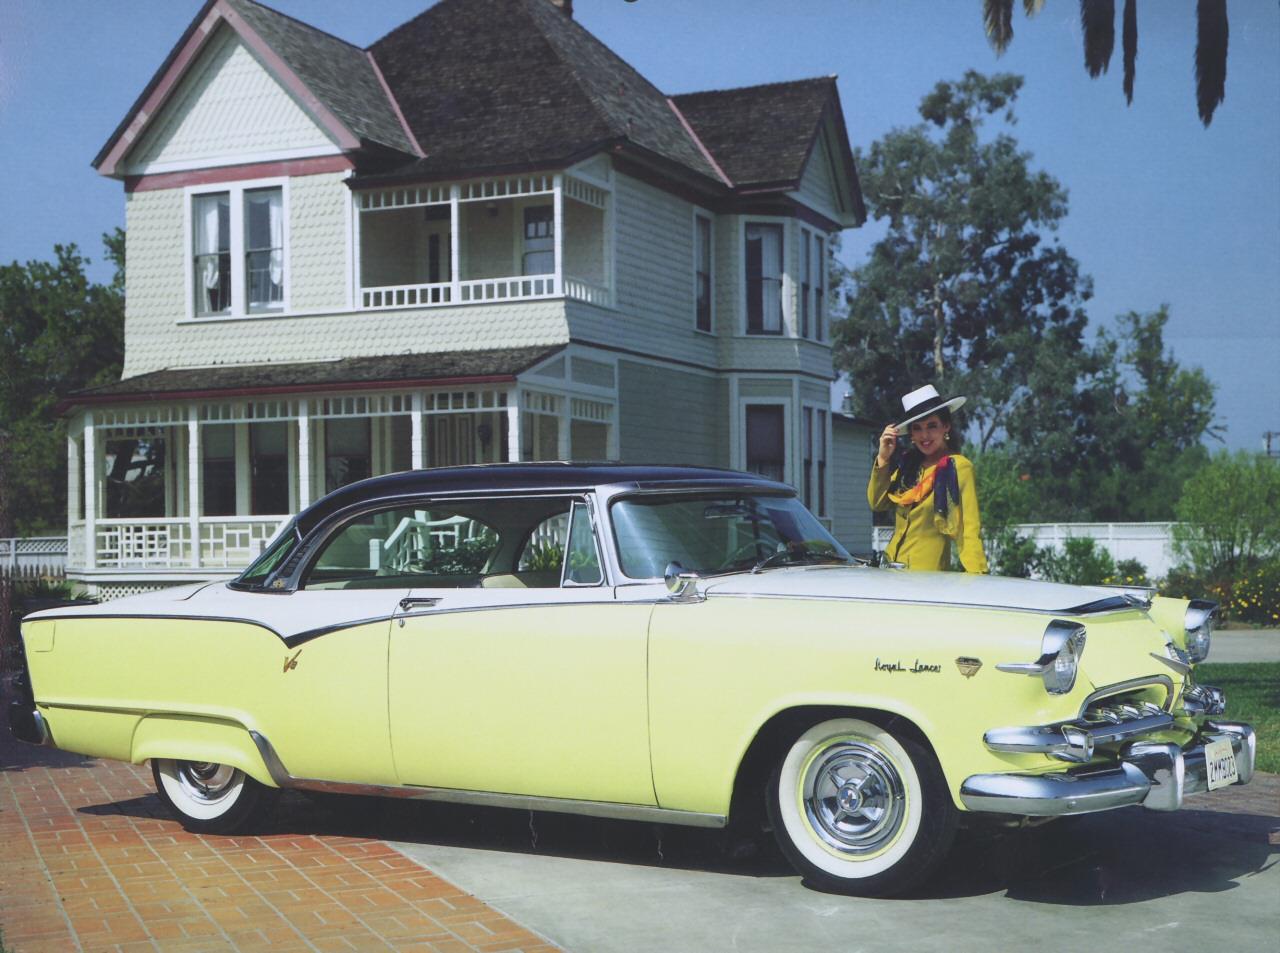 1955 dodge royal lancer convertible cream black fvr cars - 39 1955 Dodge Custom Royal Lancer Hardtop Coupe Yellow White Black